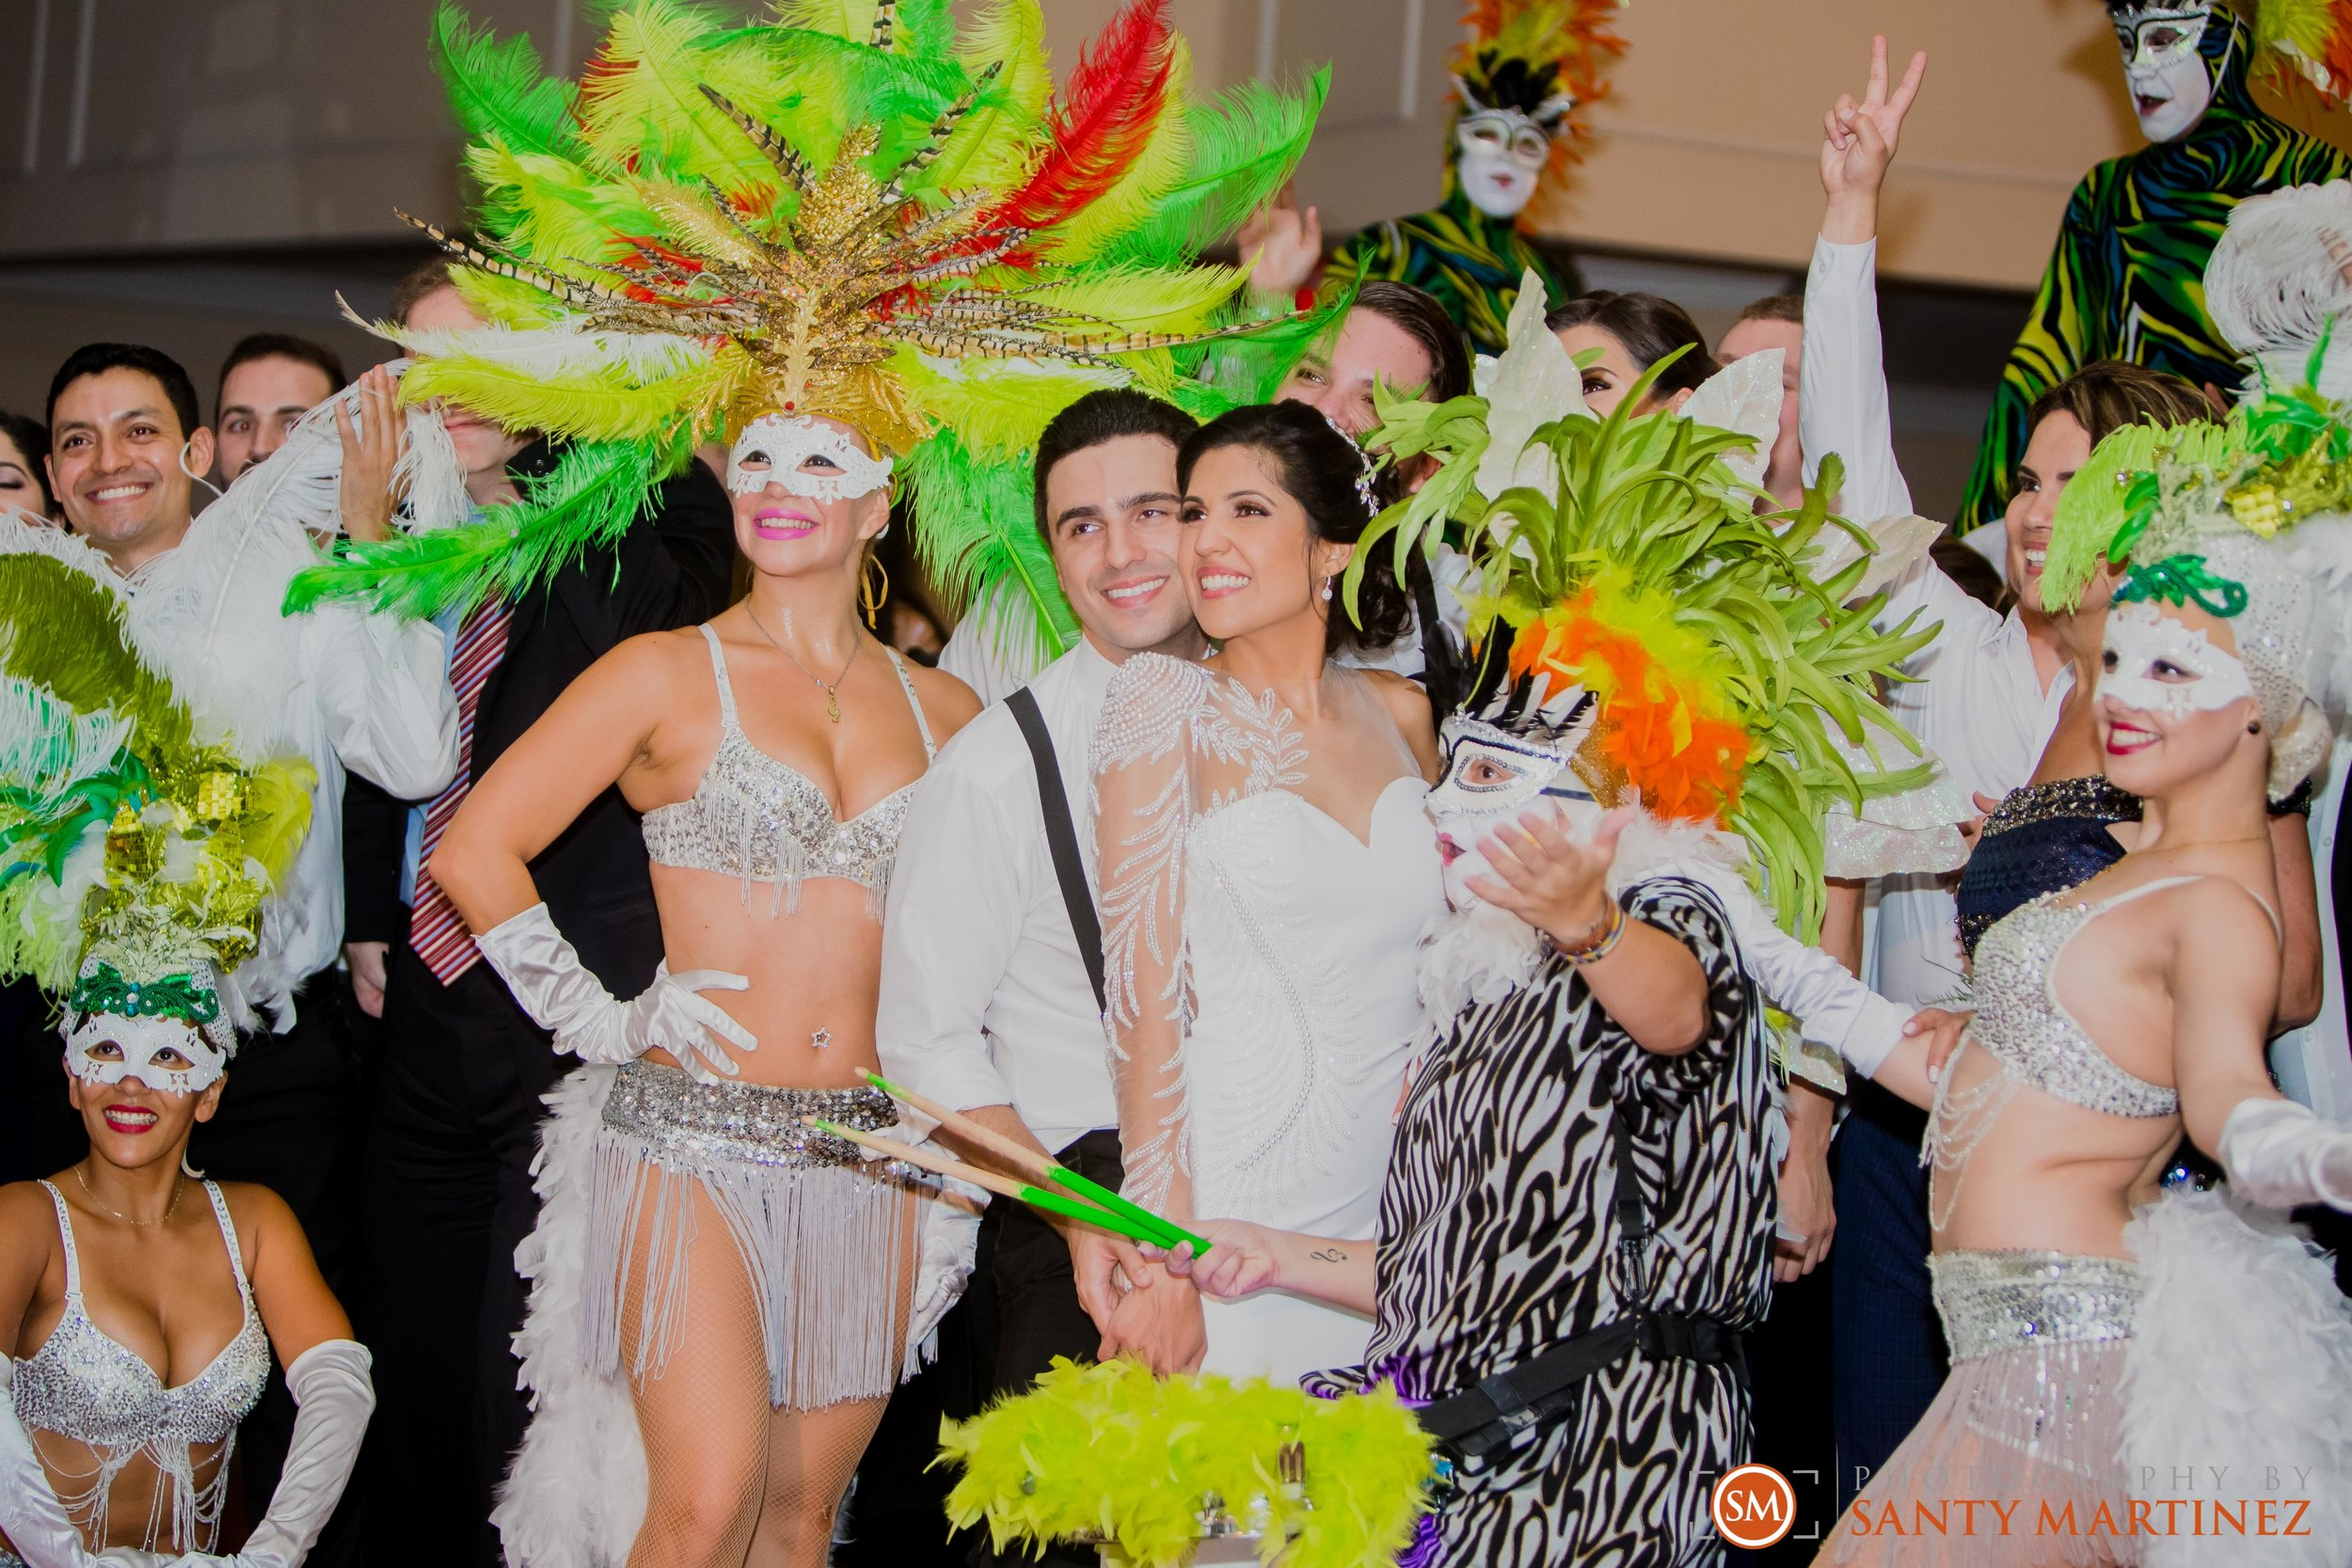 Wedding Trump National Doral Miami - Photography by Santy Martinez-45.jpg